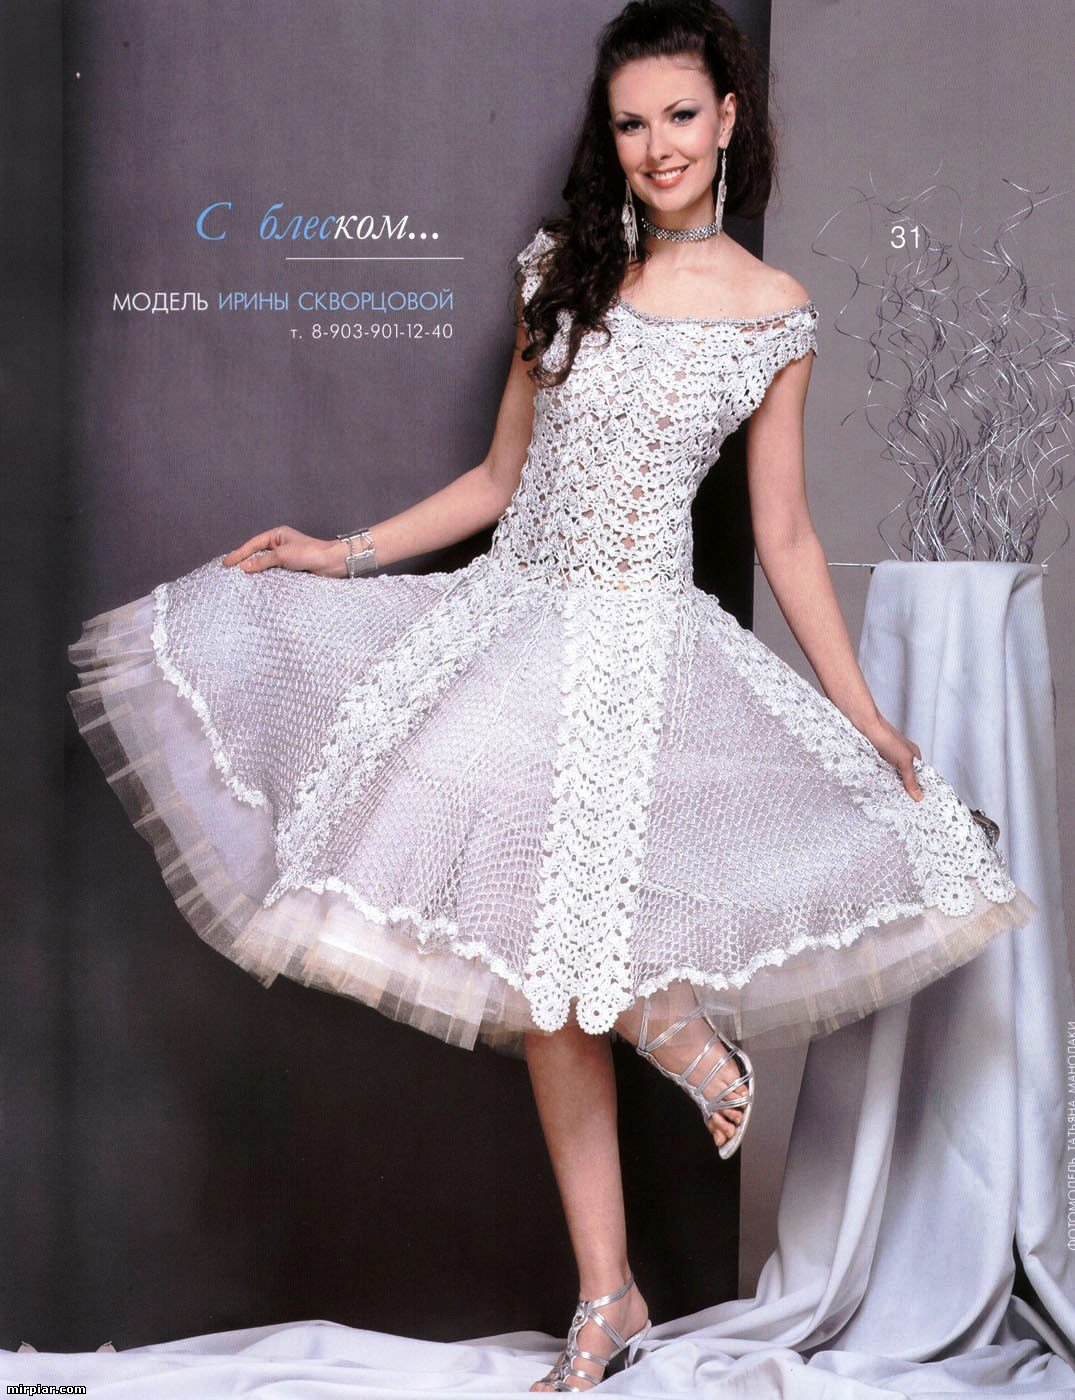 Crochet Wedding Dress Pattern.Free Crochet Patterns To Download